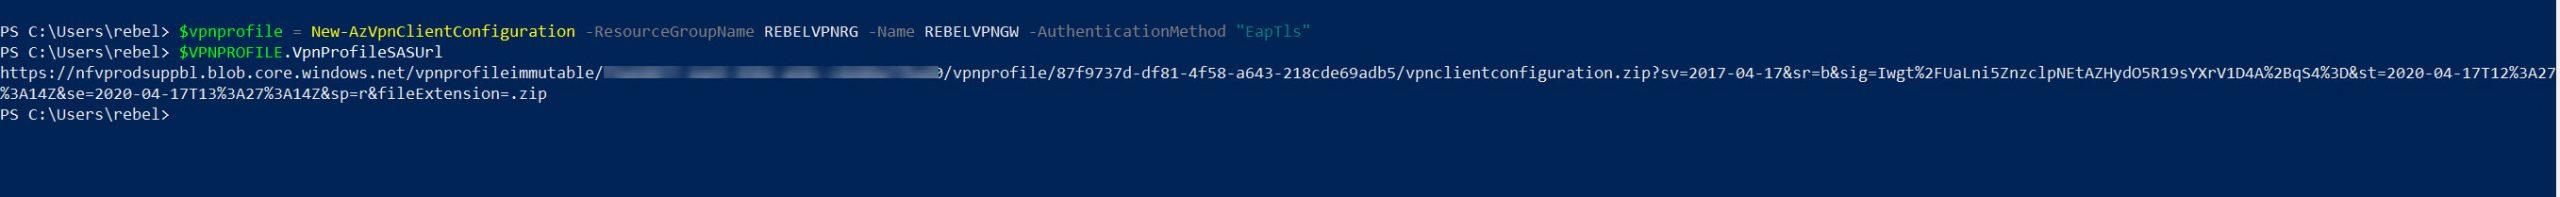 Generate VPN profile settings XML